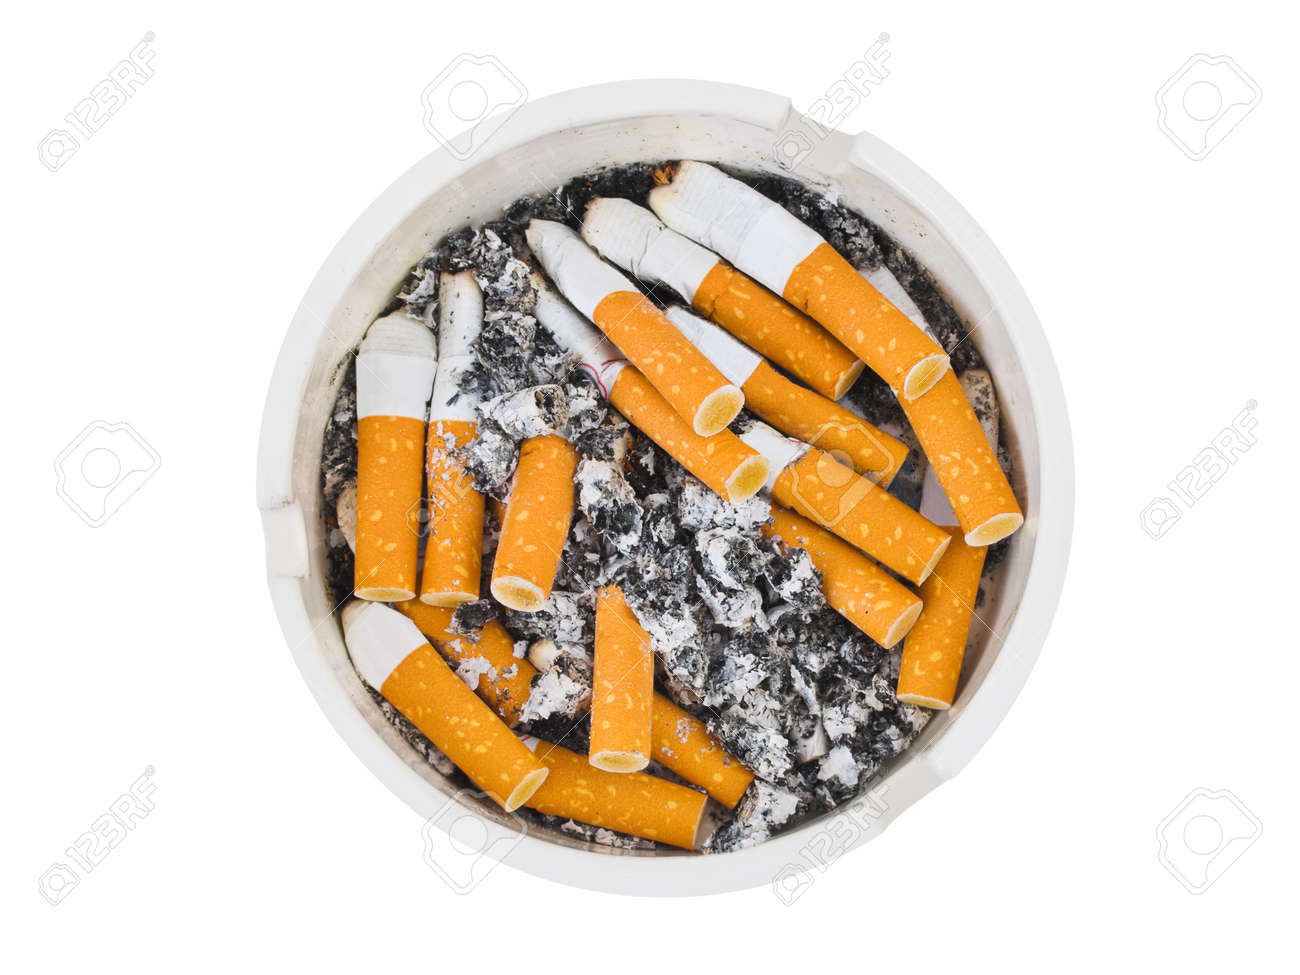 Ashtray and cigarettes isolated on white background - 9856217